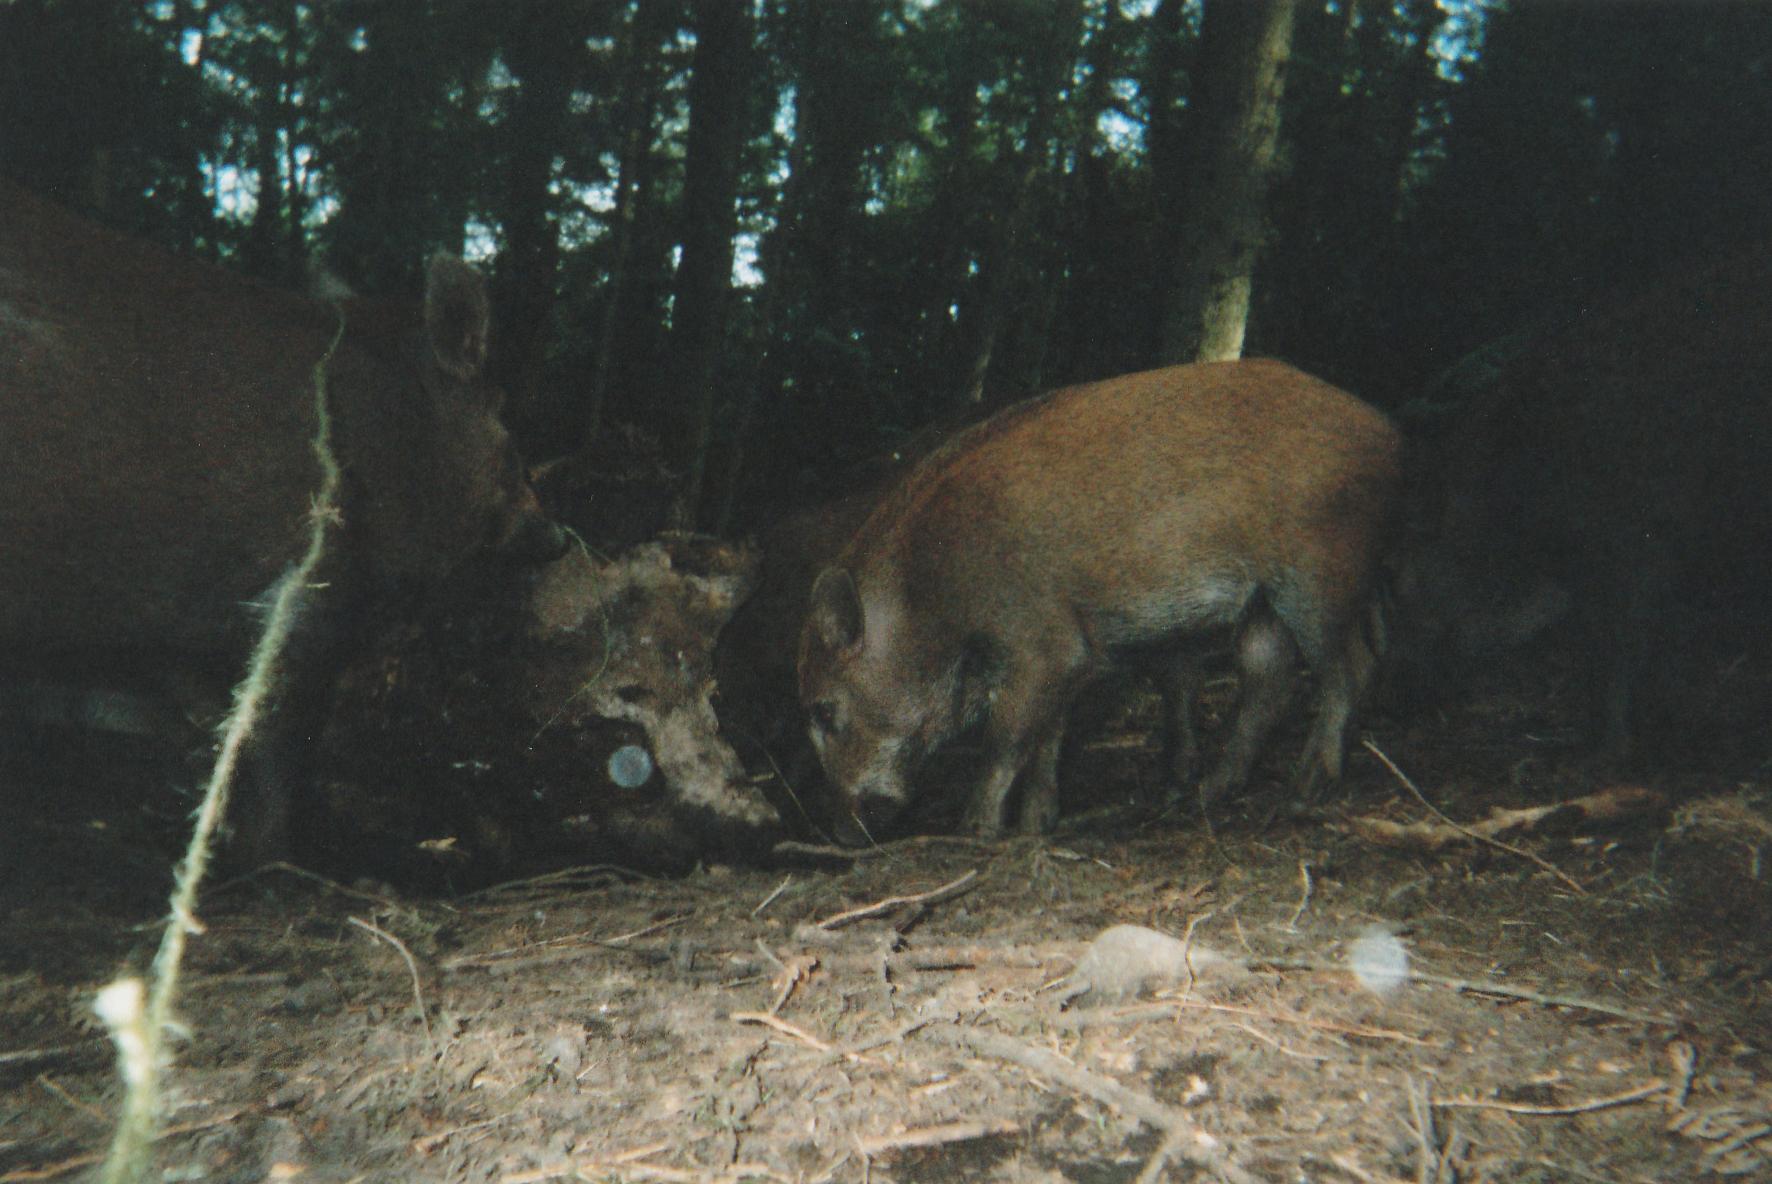 Wild Boar Photos 27.jpg